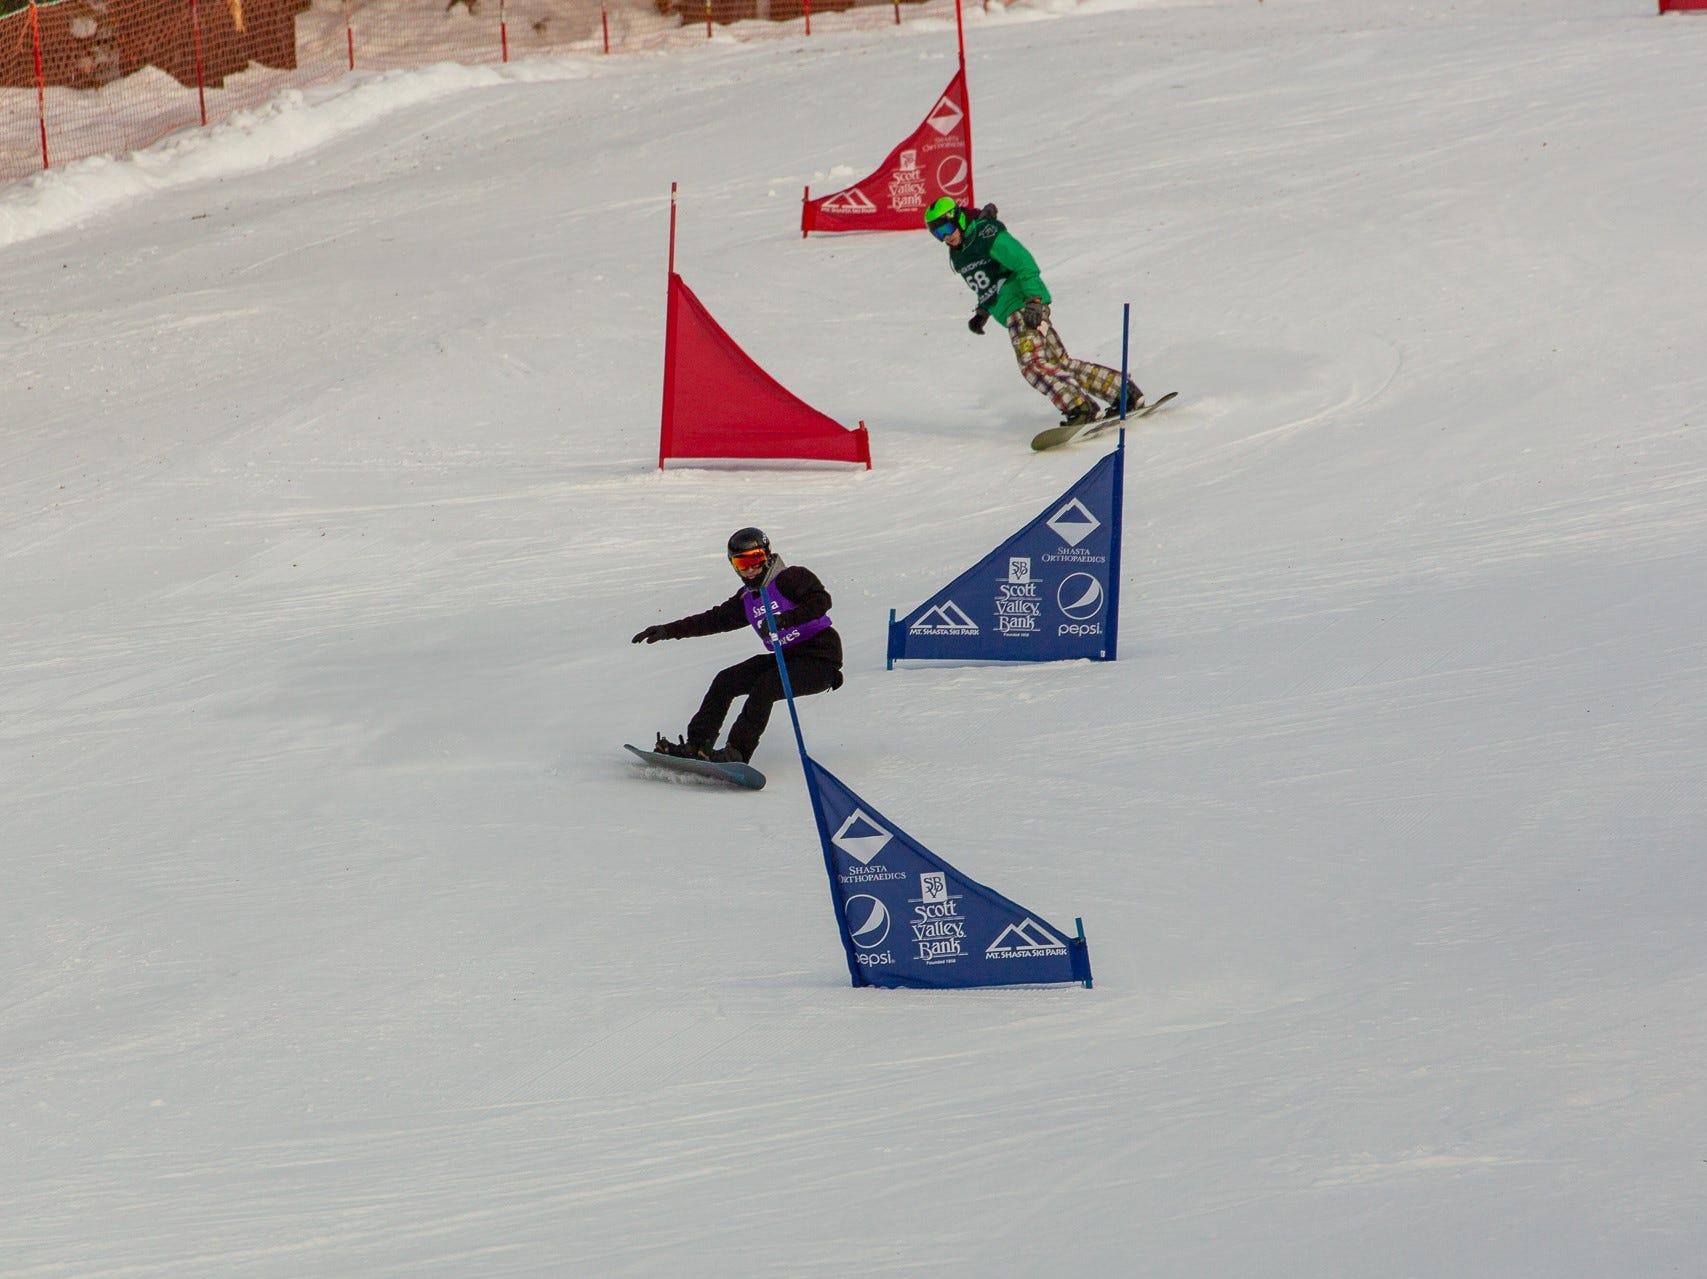 Joseph Vericker of Shasta competes in the first high school snowboard meet of 2019 on Monday, Jan. 14 at Mt. Shasta Ski Park.